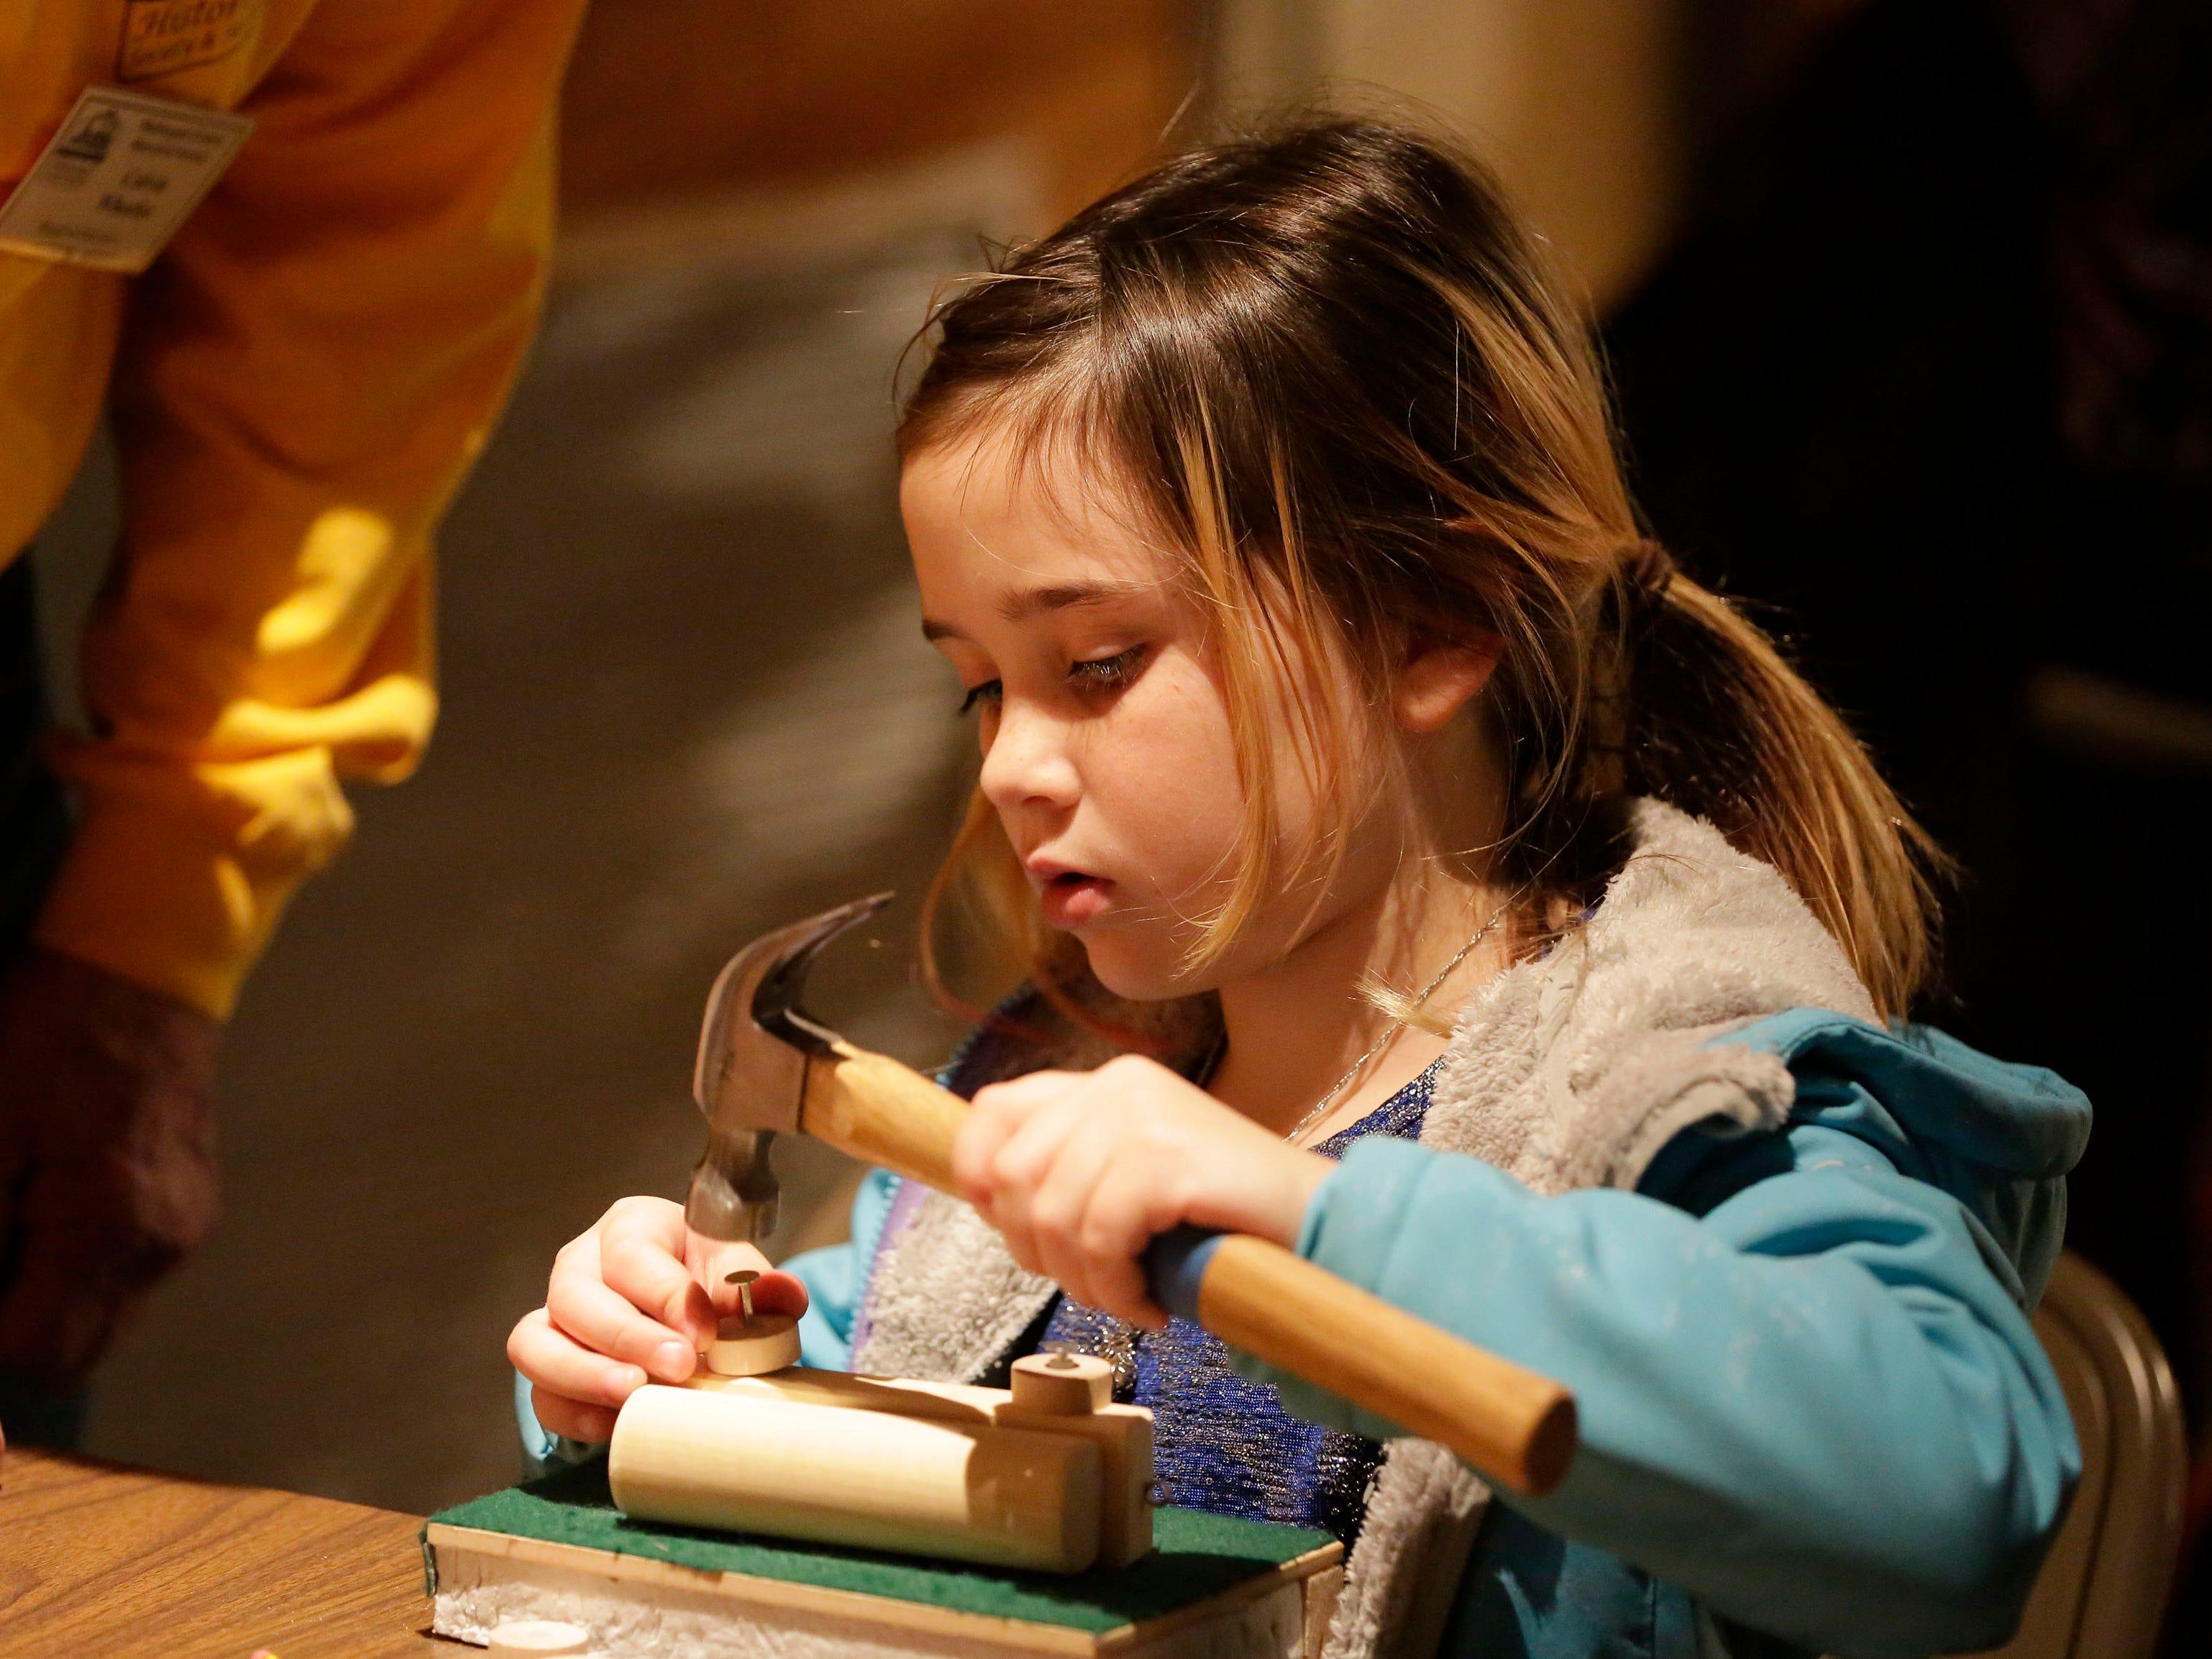 Leora Hurtado, 8, of Spring Green, Wis., creates a toy at a workshop at the Sheboygan County Historical Museum's Holiday Memories, Friday, November 23, 2018, in Sheboygan, Wis.